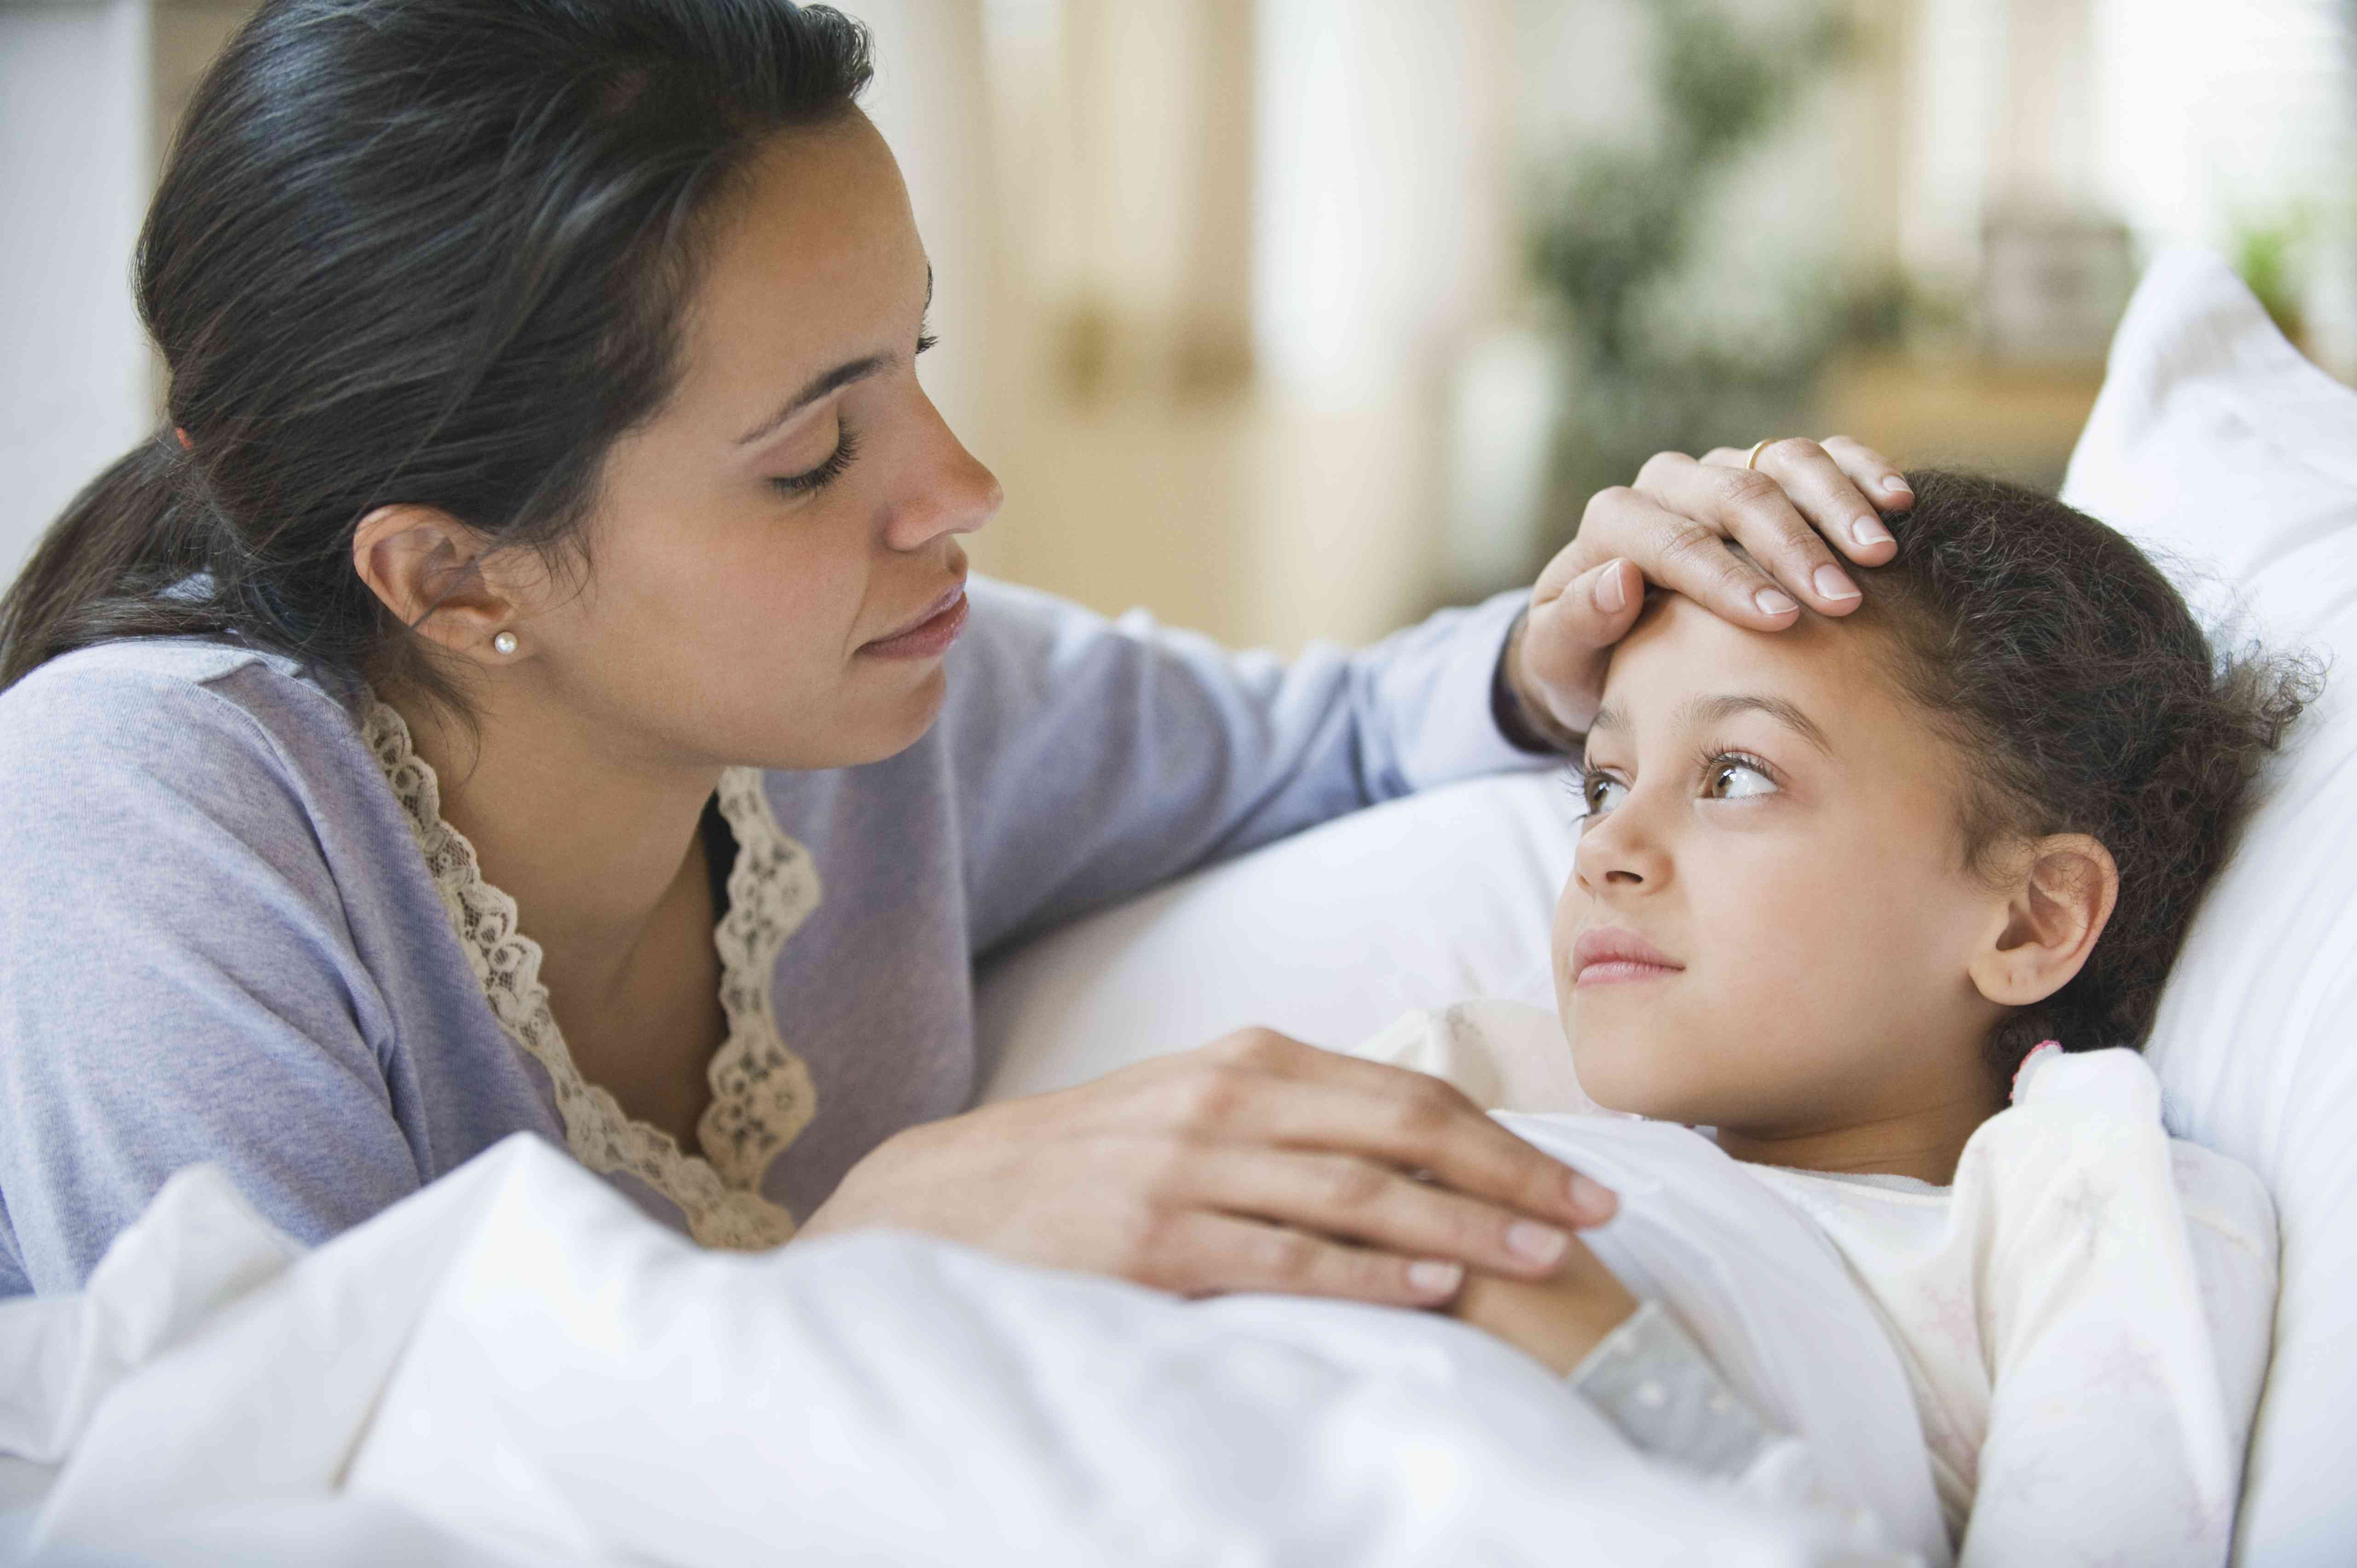 Hispanic mother comforting sick child